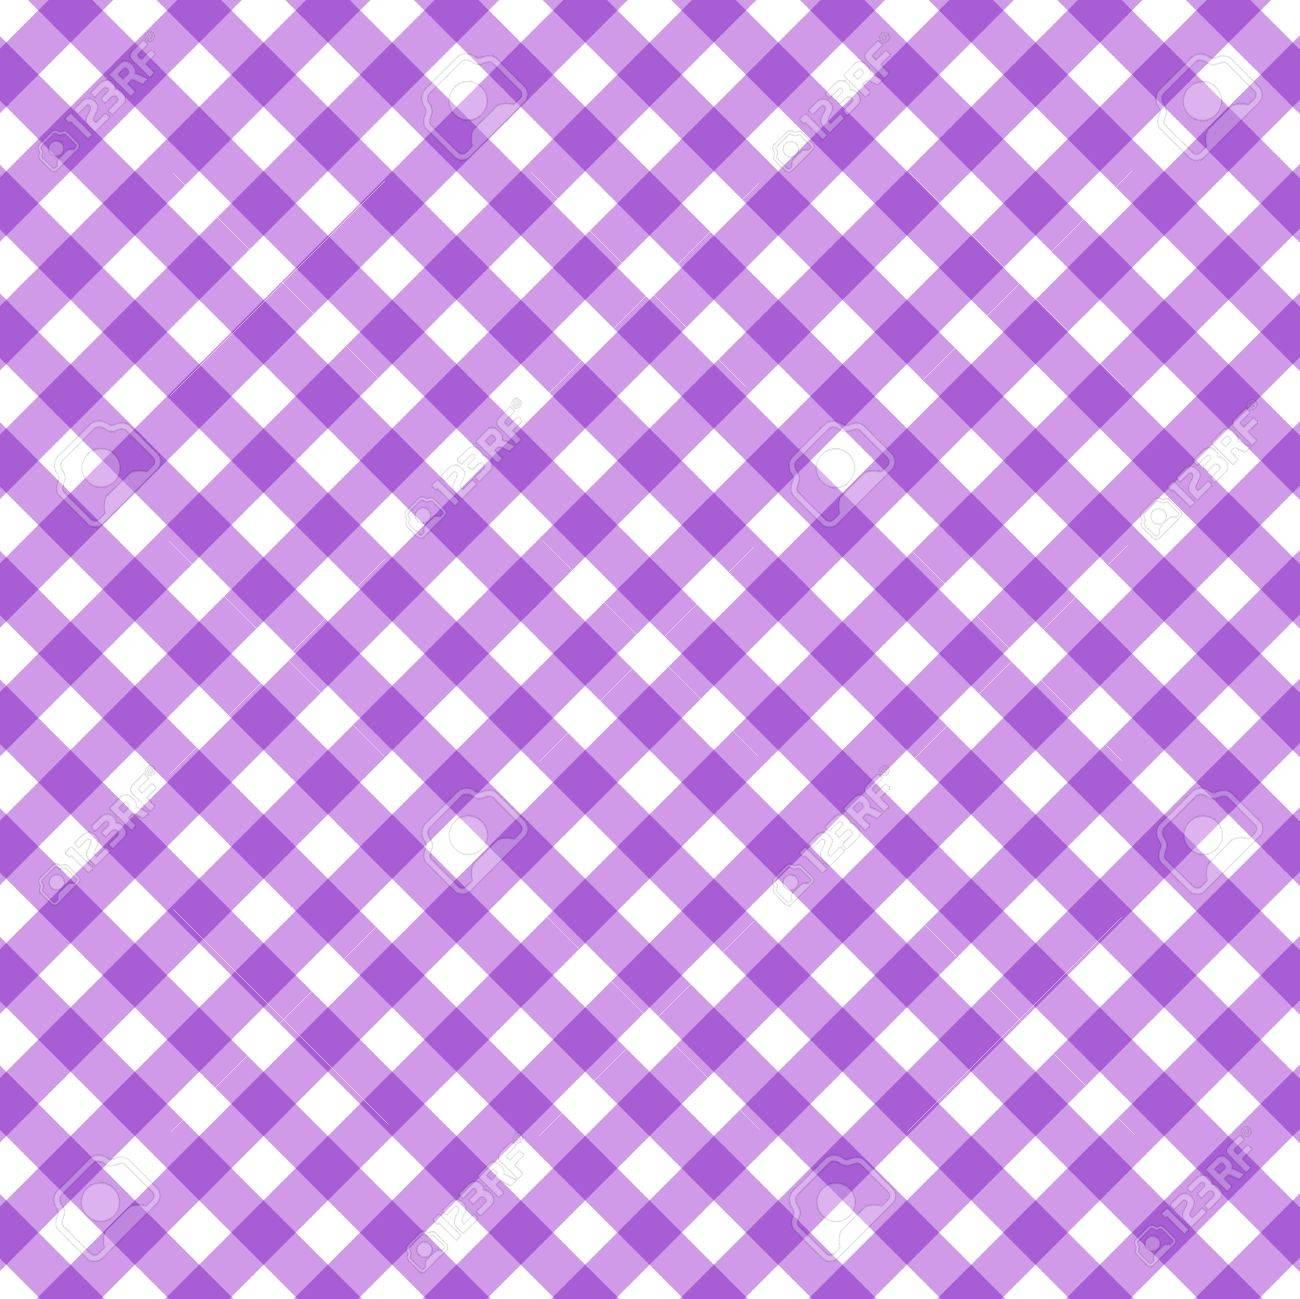 Genial Tartan Plaid Seamless Pattern. Kitchen Checkered Purple Tablecloth Napkin  Fabric Background. Stock Vector